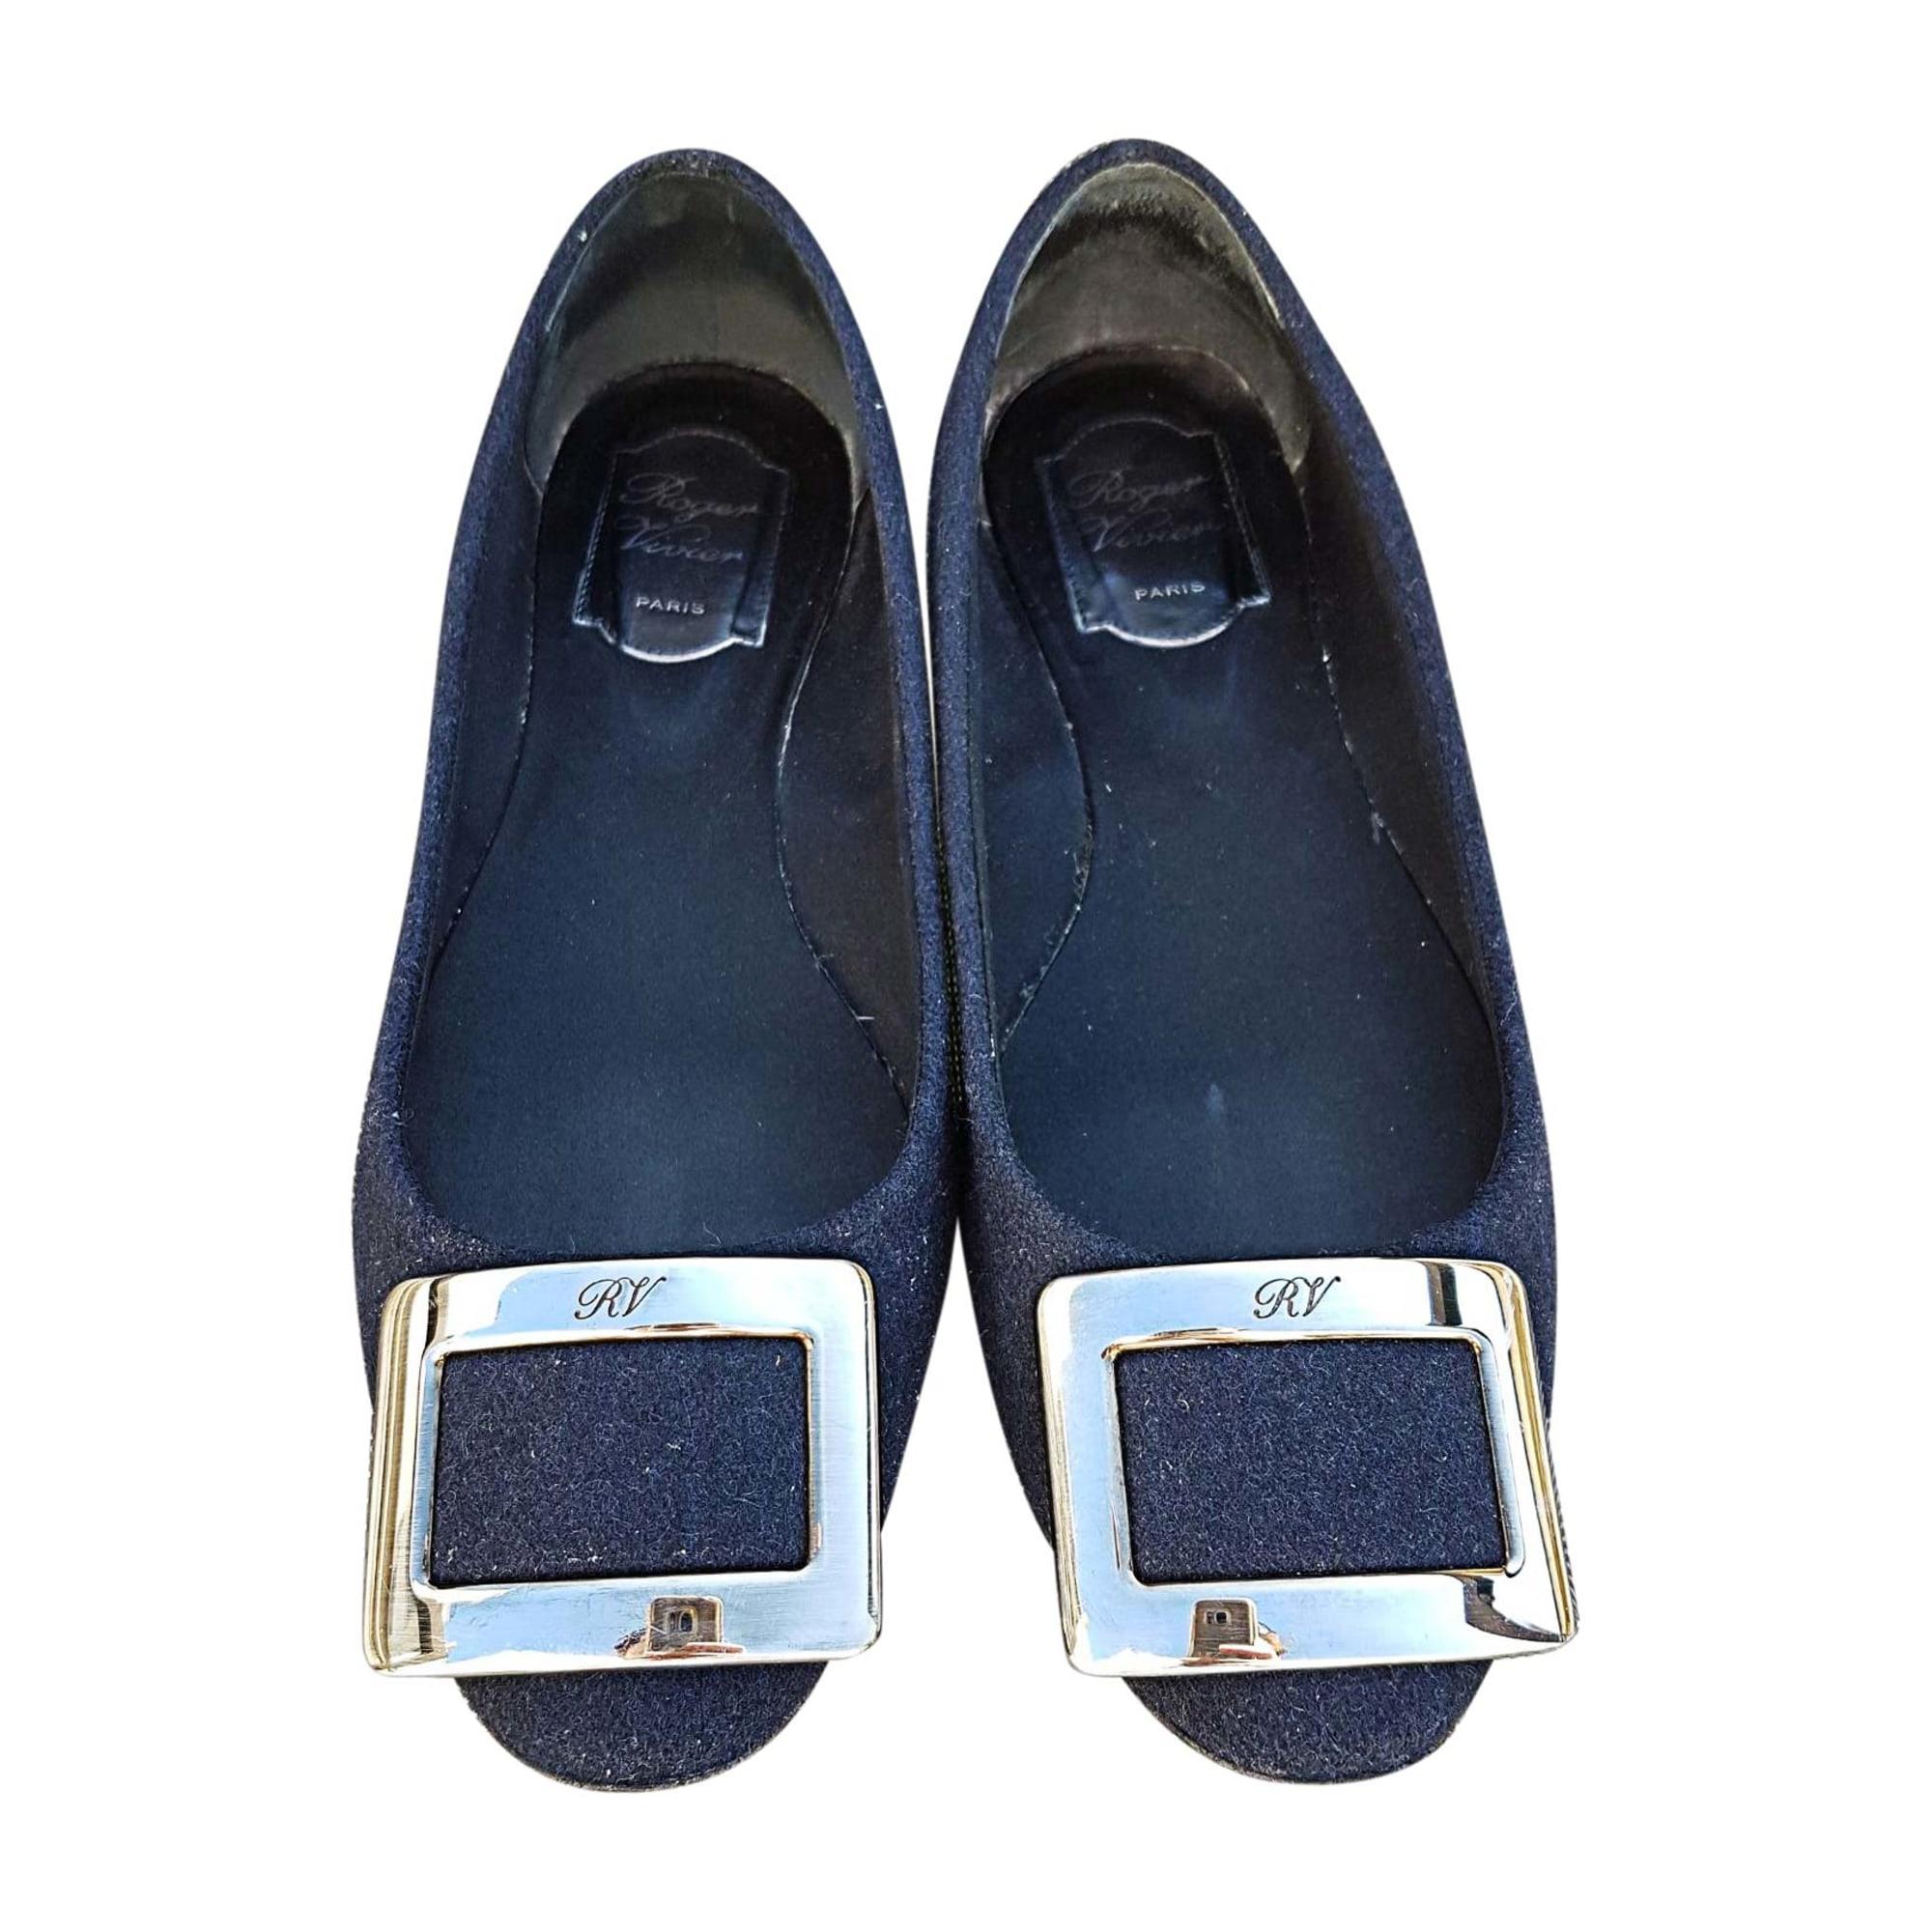 Ballet Flats ROGER VIVIER Blue, navy, turquoise